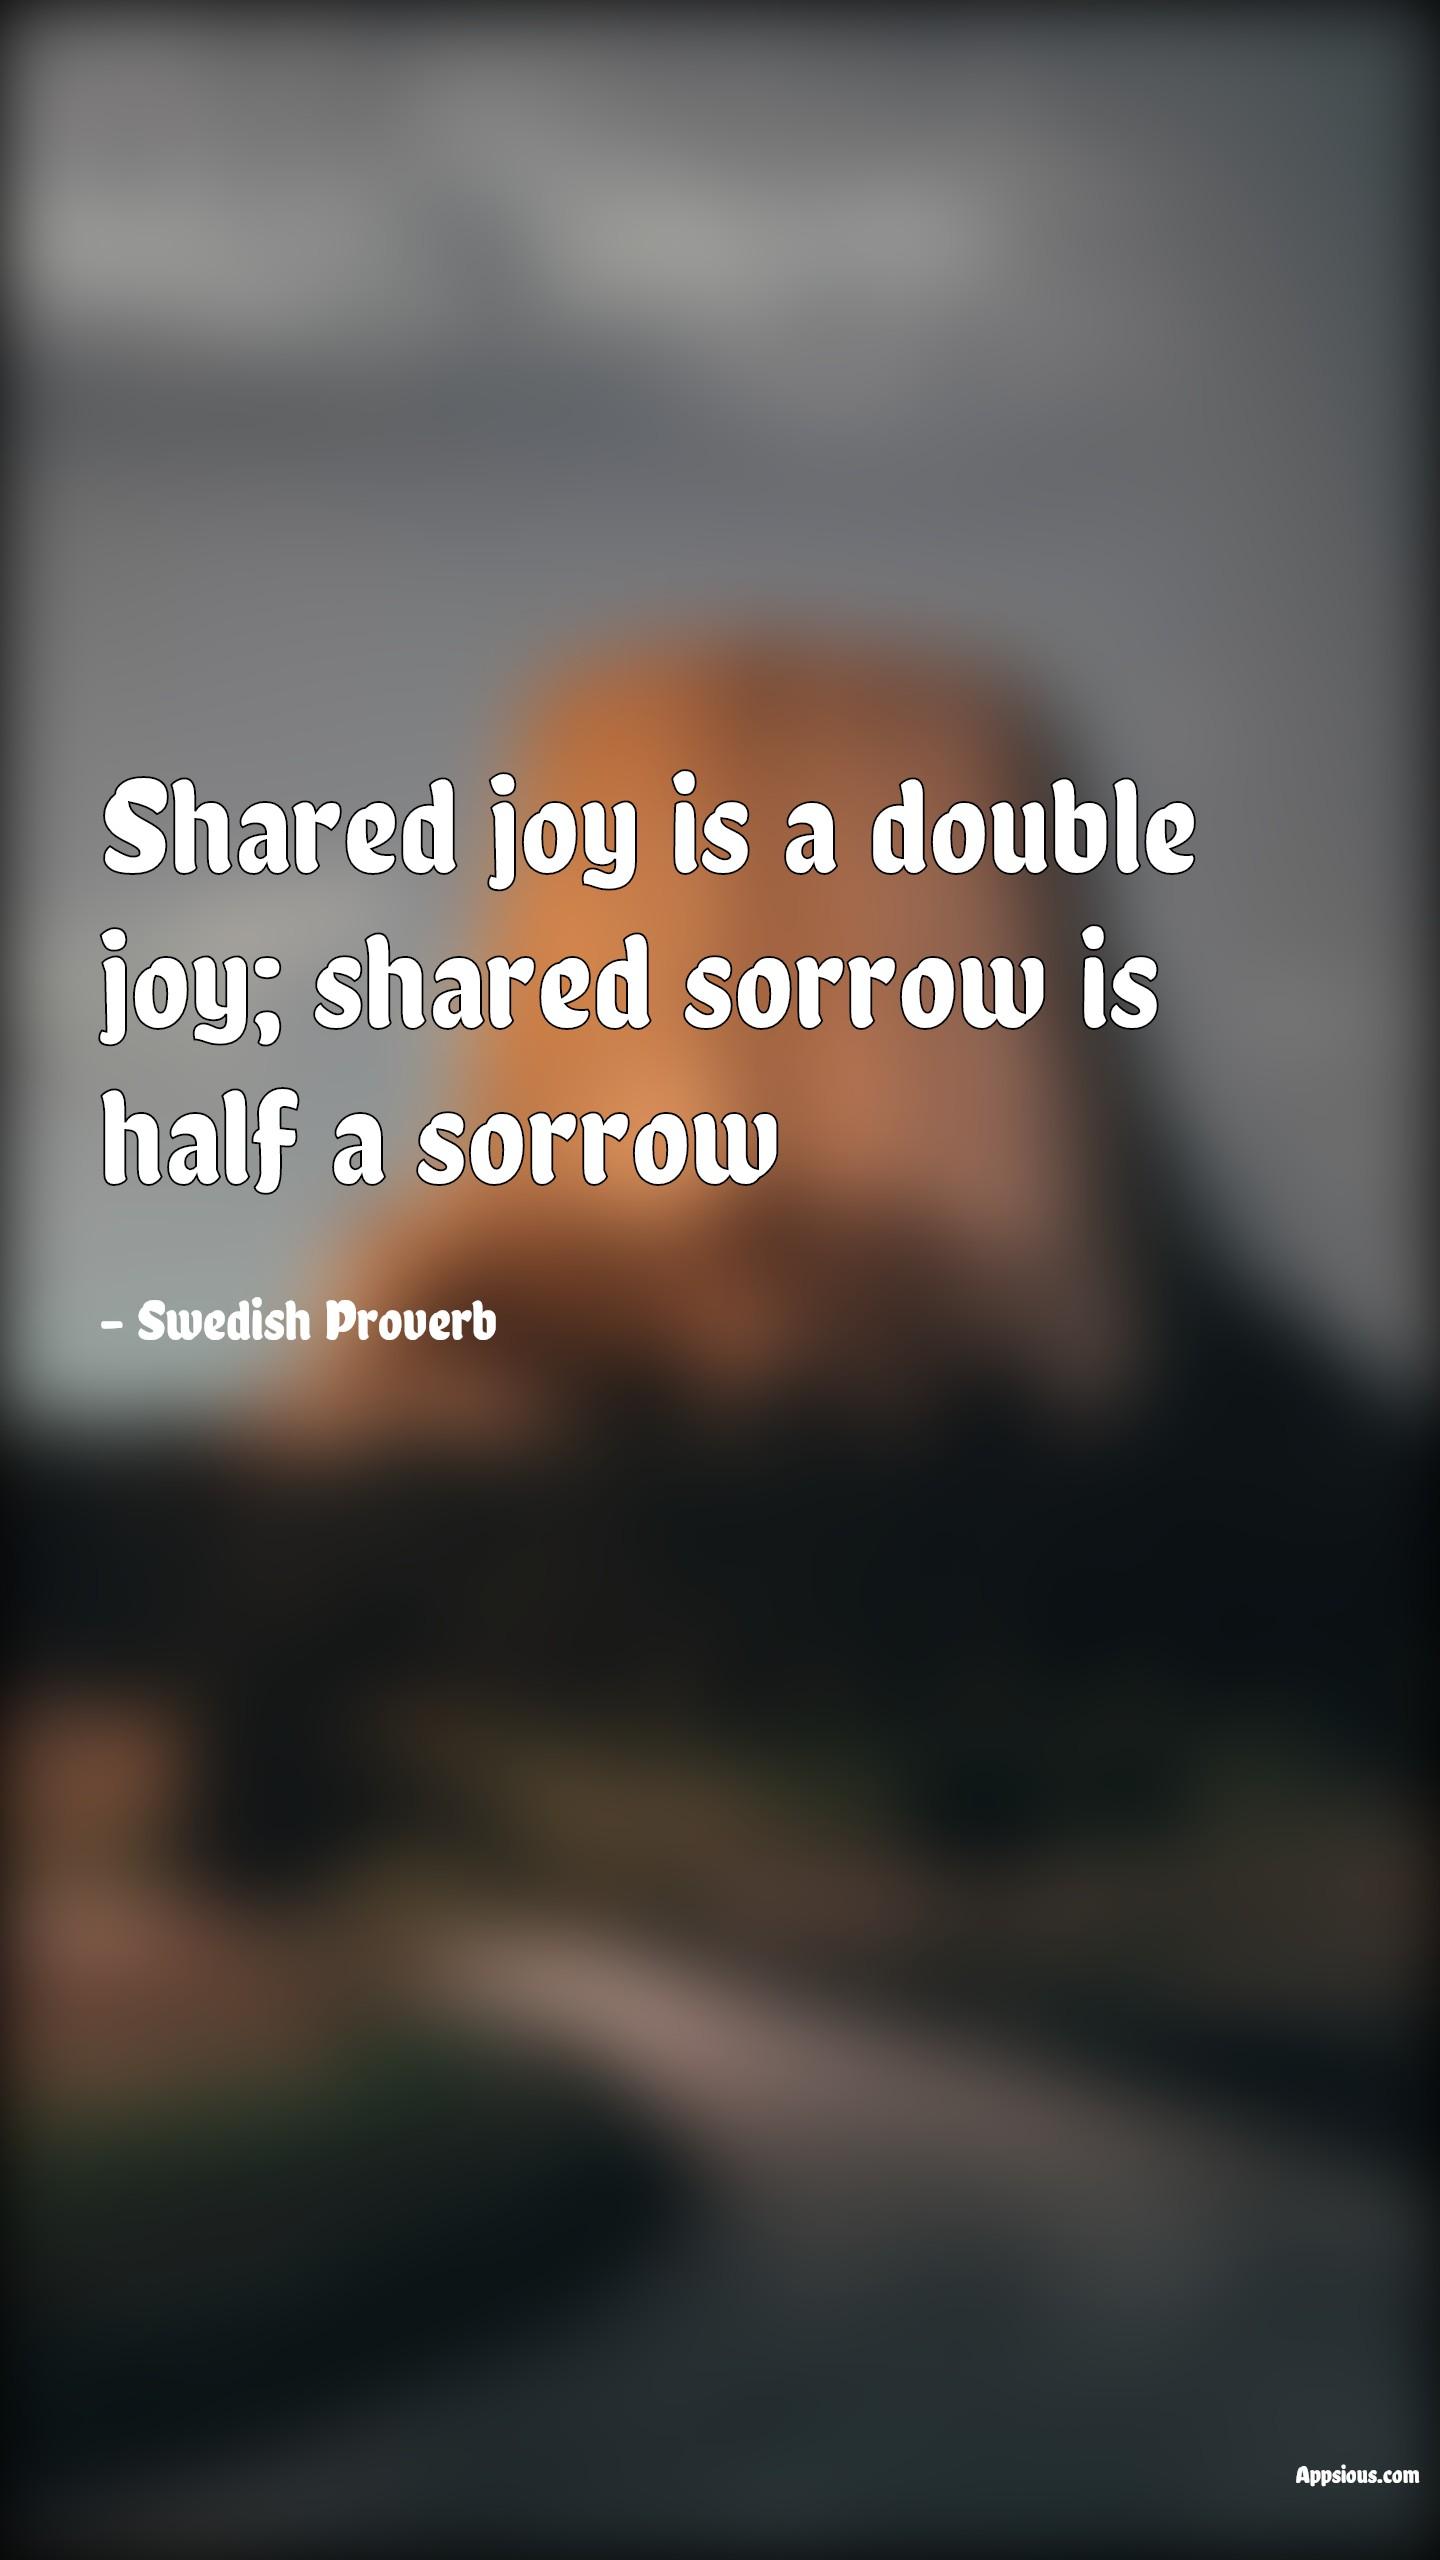 Shared joy is a double joy; shared sorrow is half a sorrow